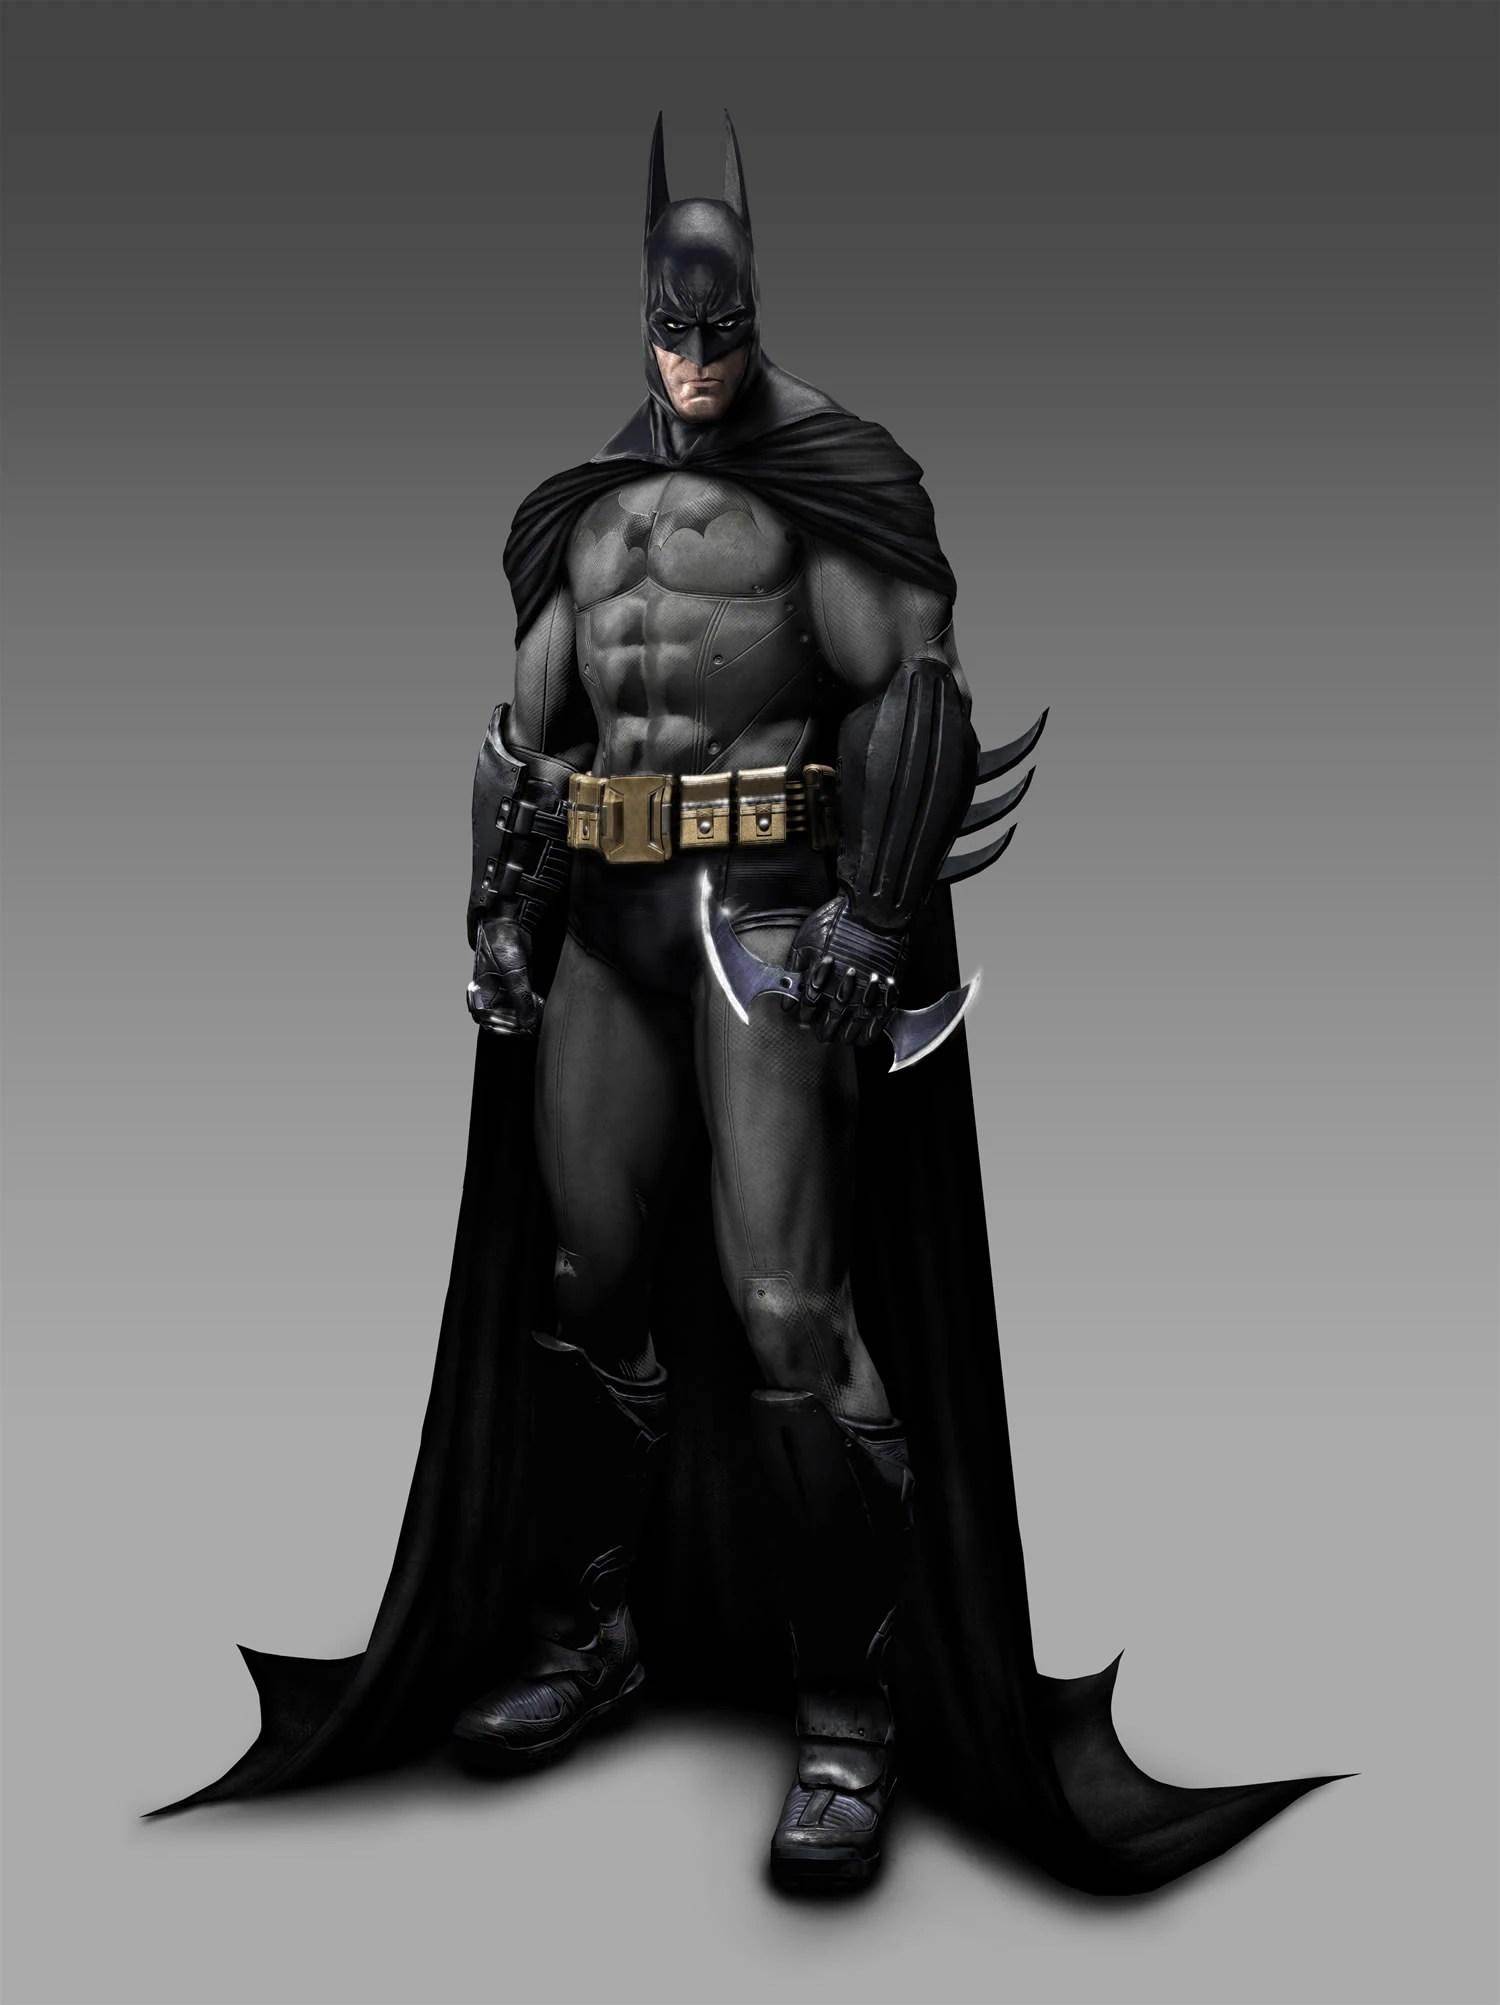 Image Batman Arkham Asylum Artwork Batmanjpg Batman